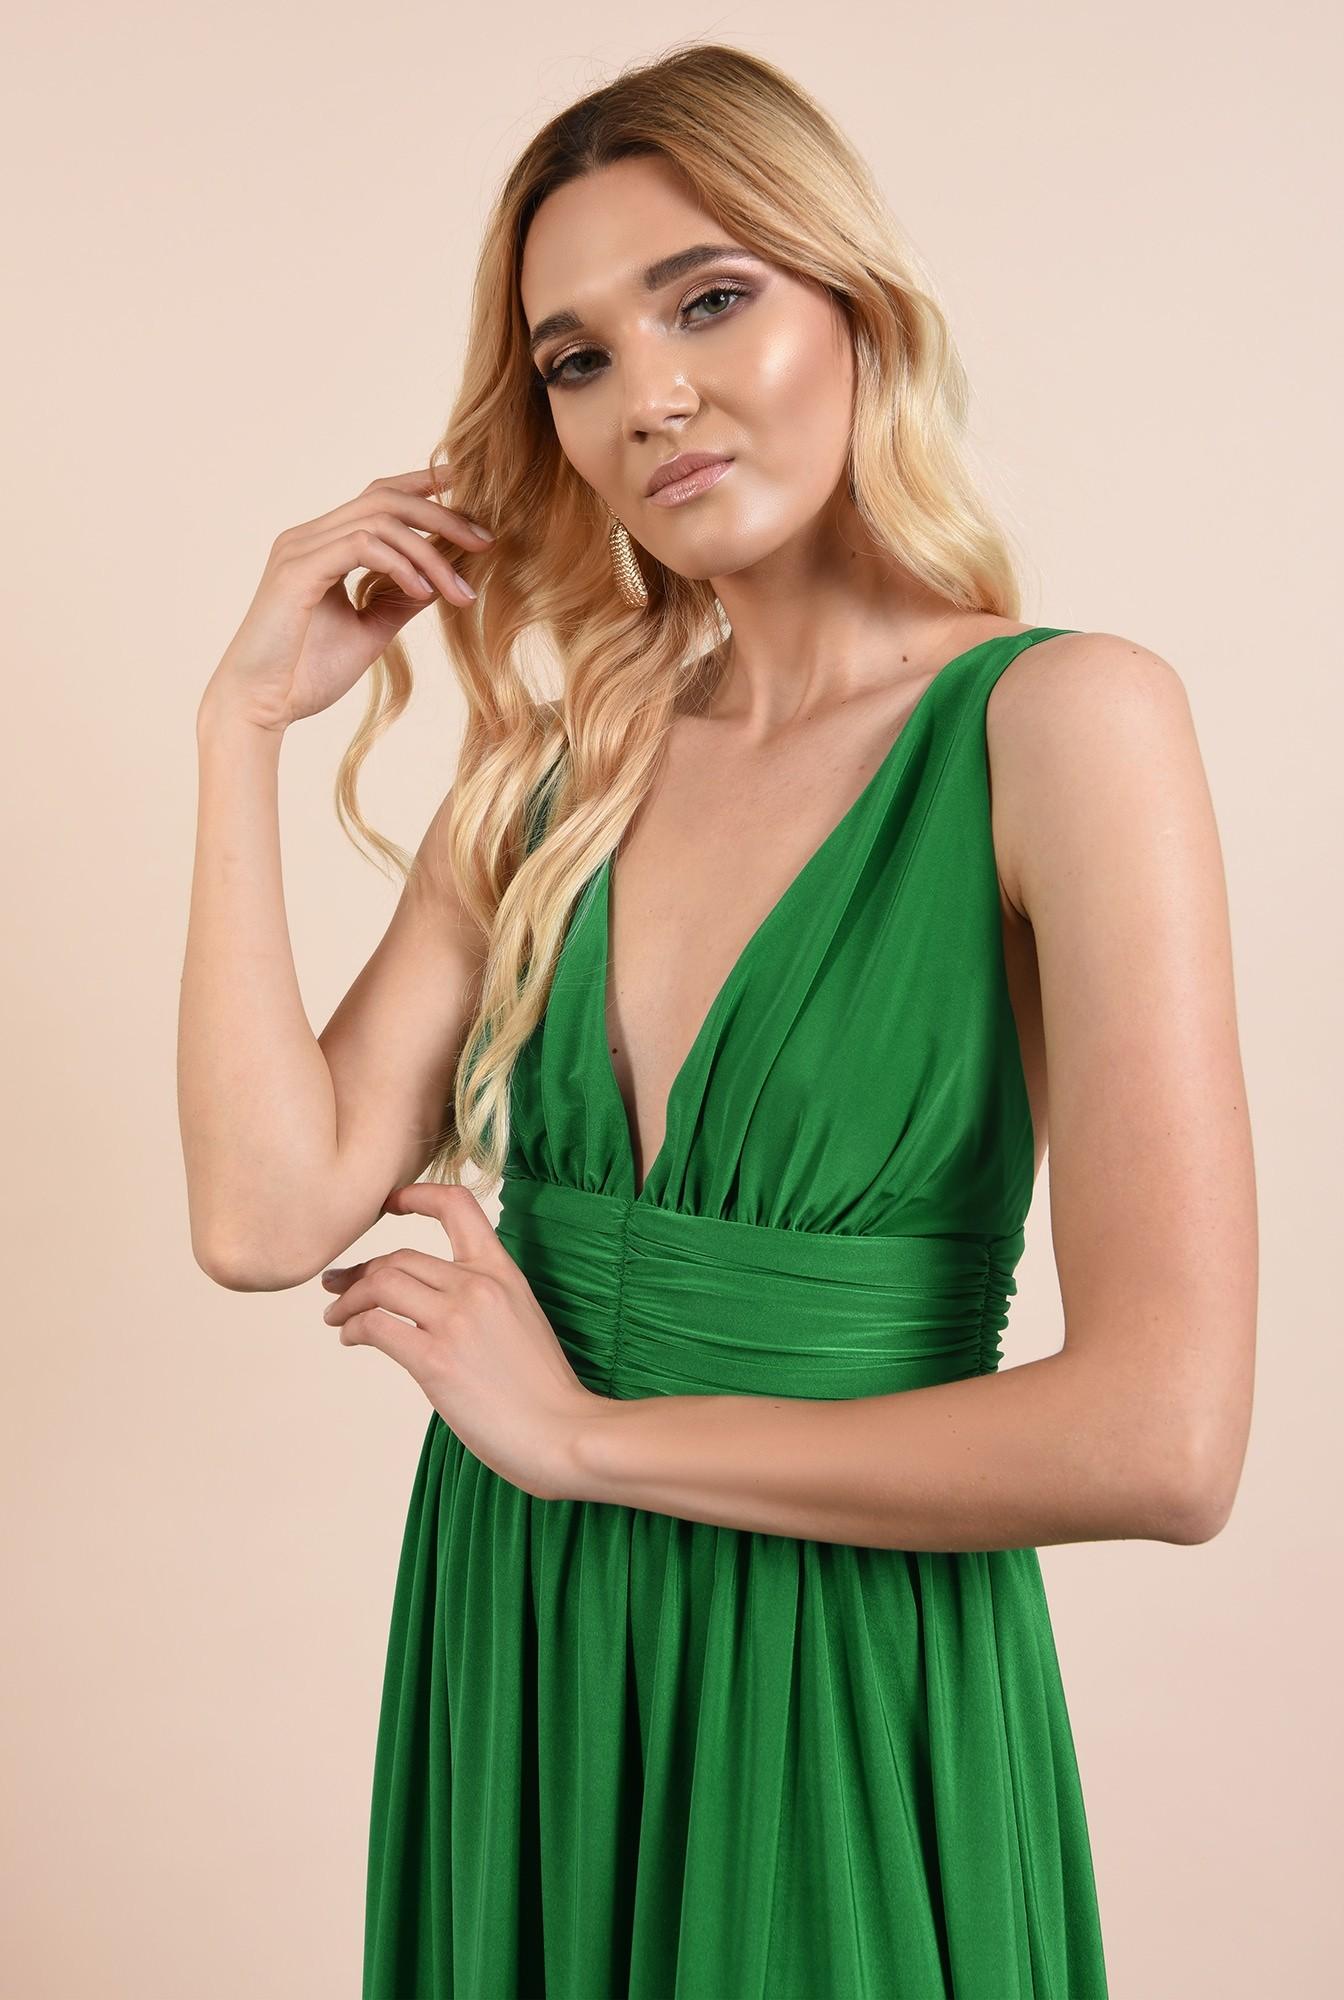 2 - rochie de ocazie, verde, din lycra, cu anchior adanc, spate gol, Poema